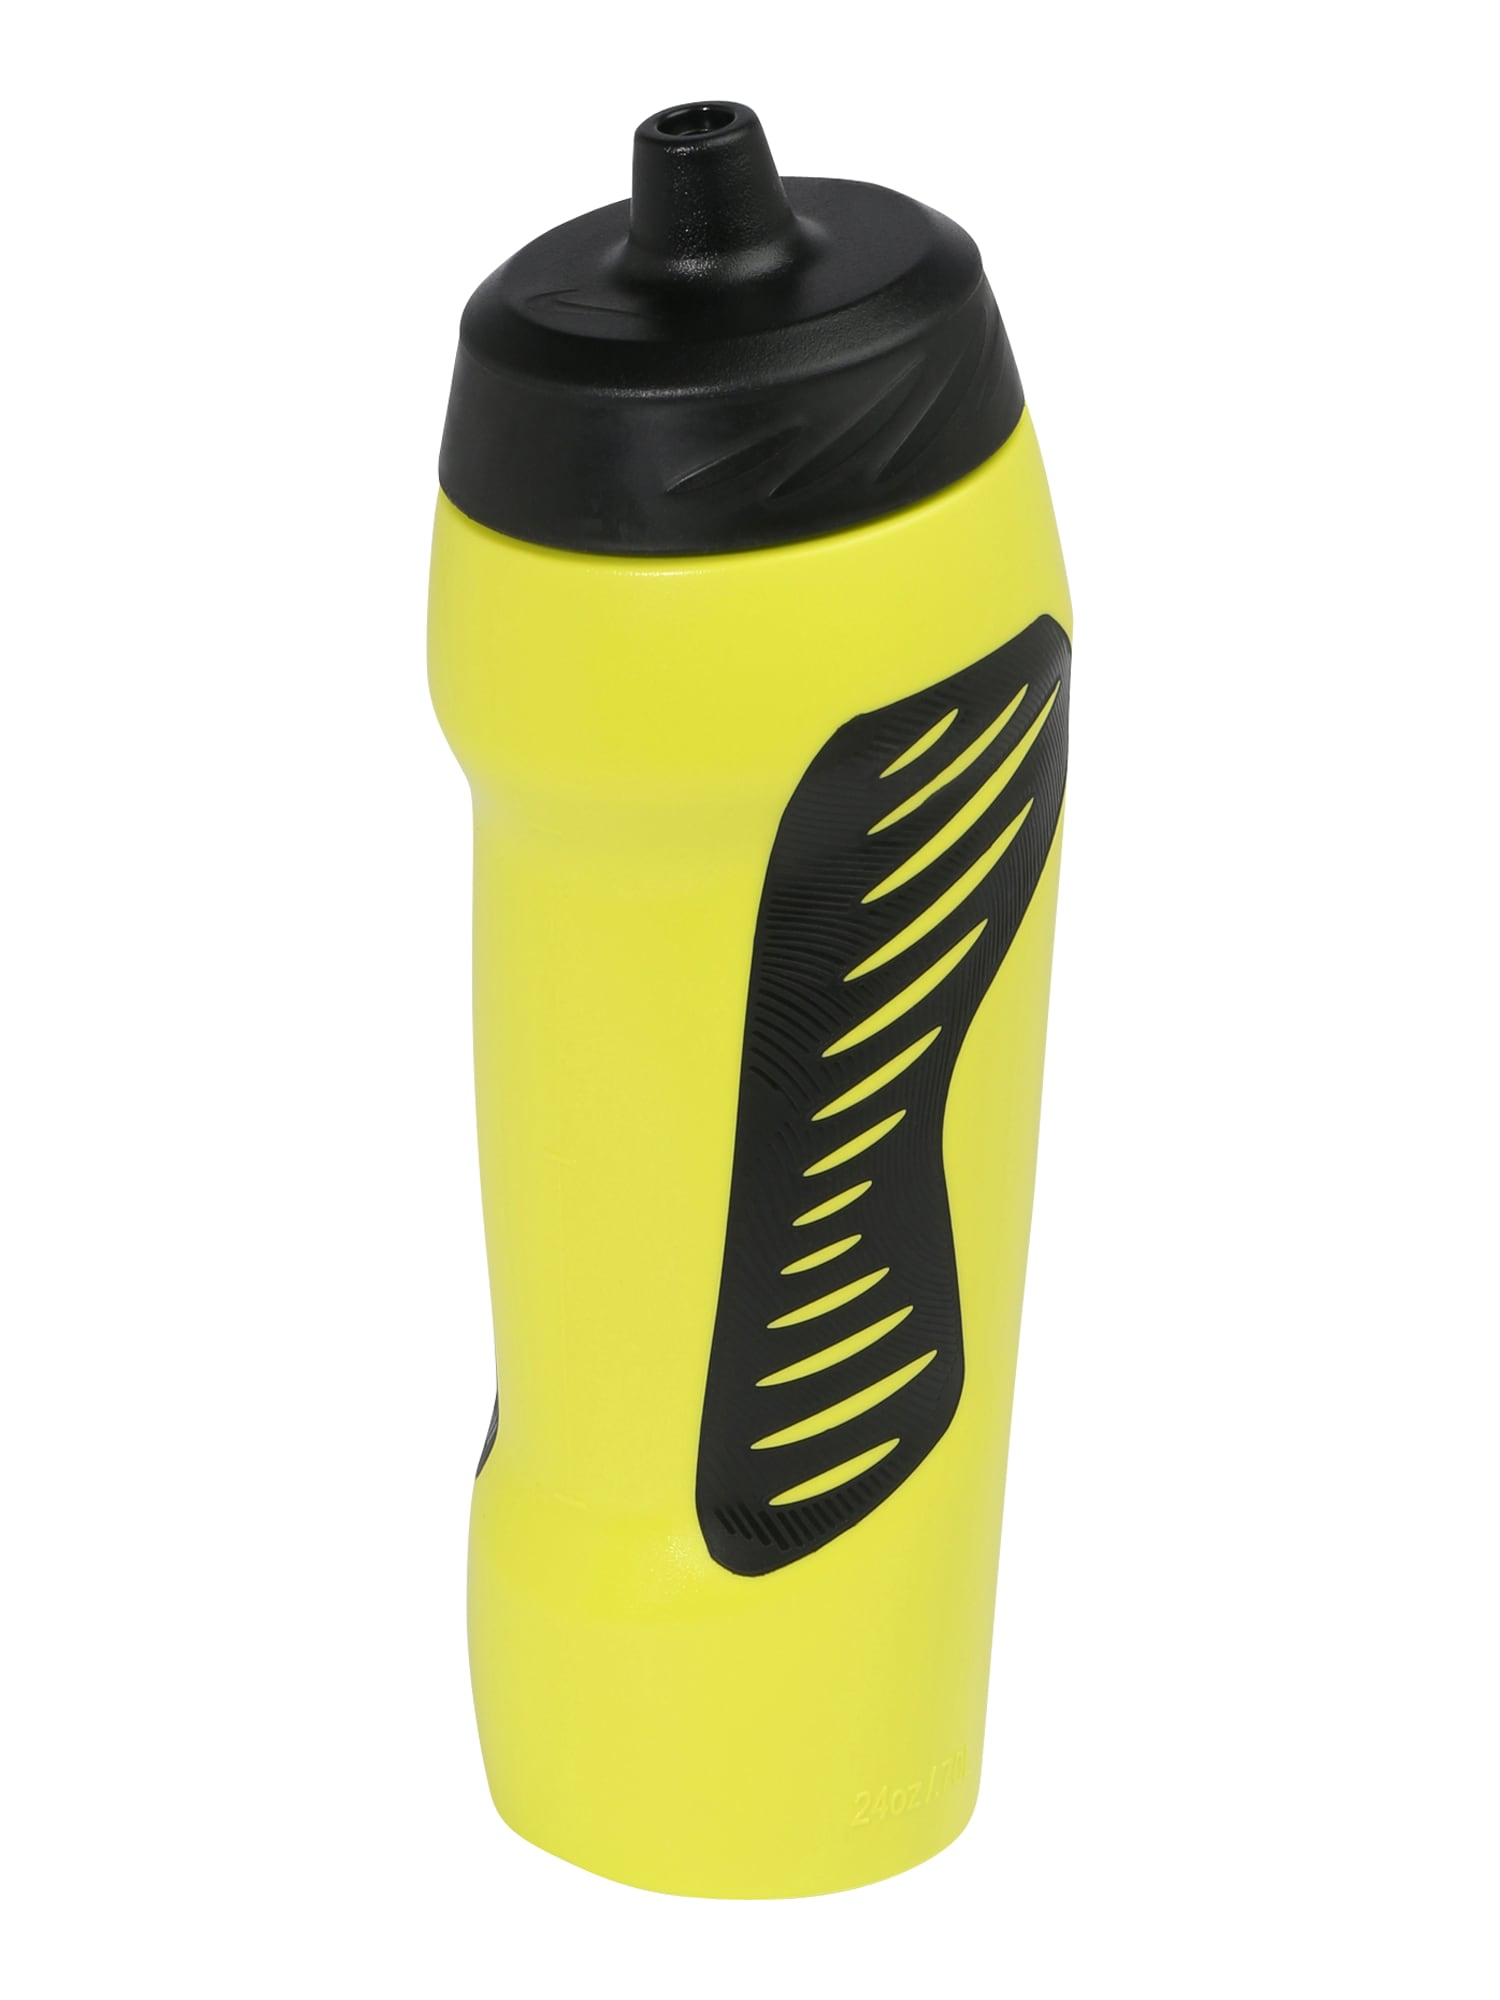 NIKE Accessoires Gertuvė 'Hyperfuel' juoda / neoninė geltona